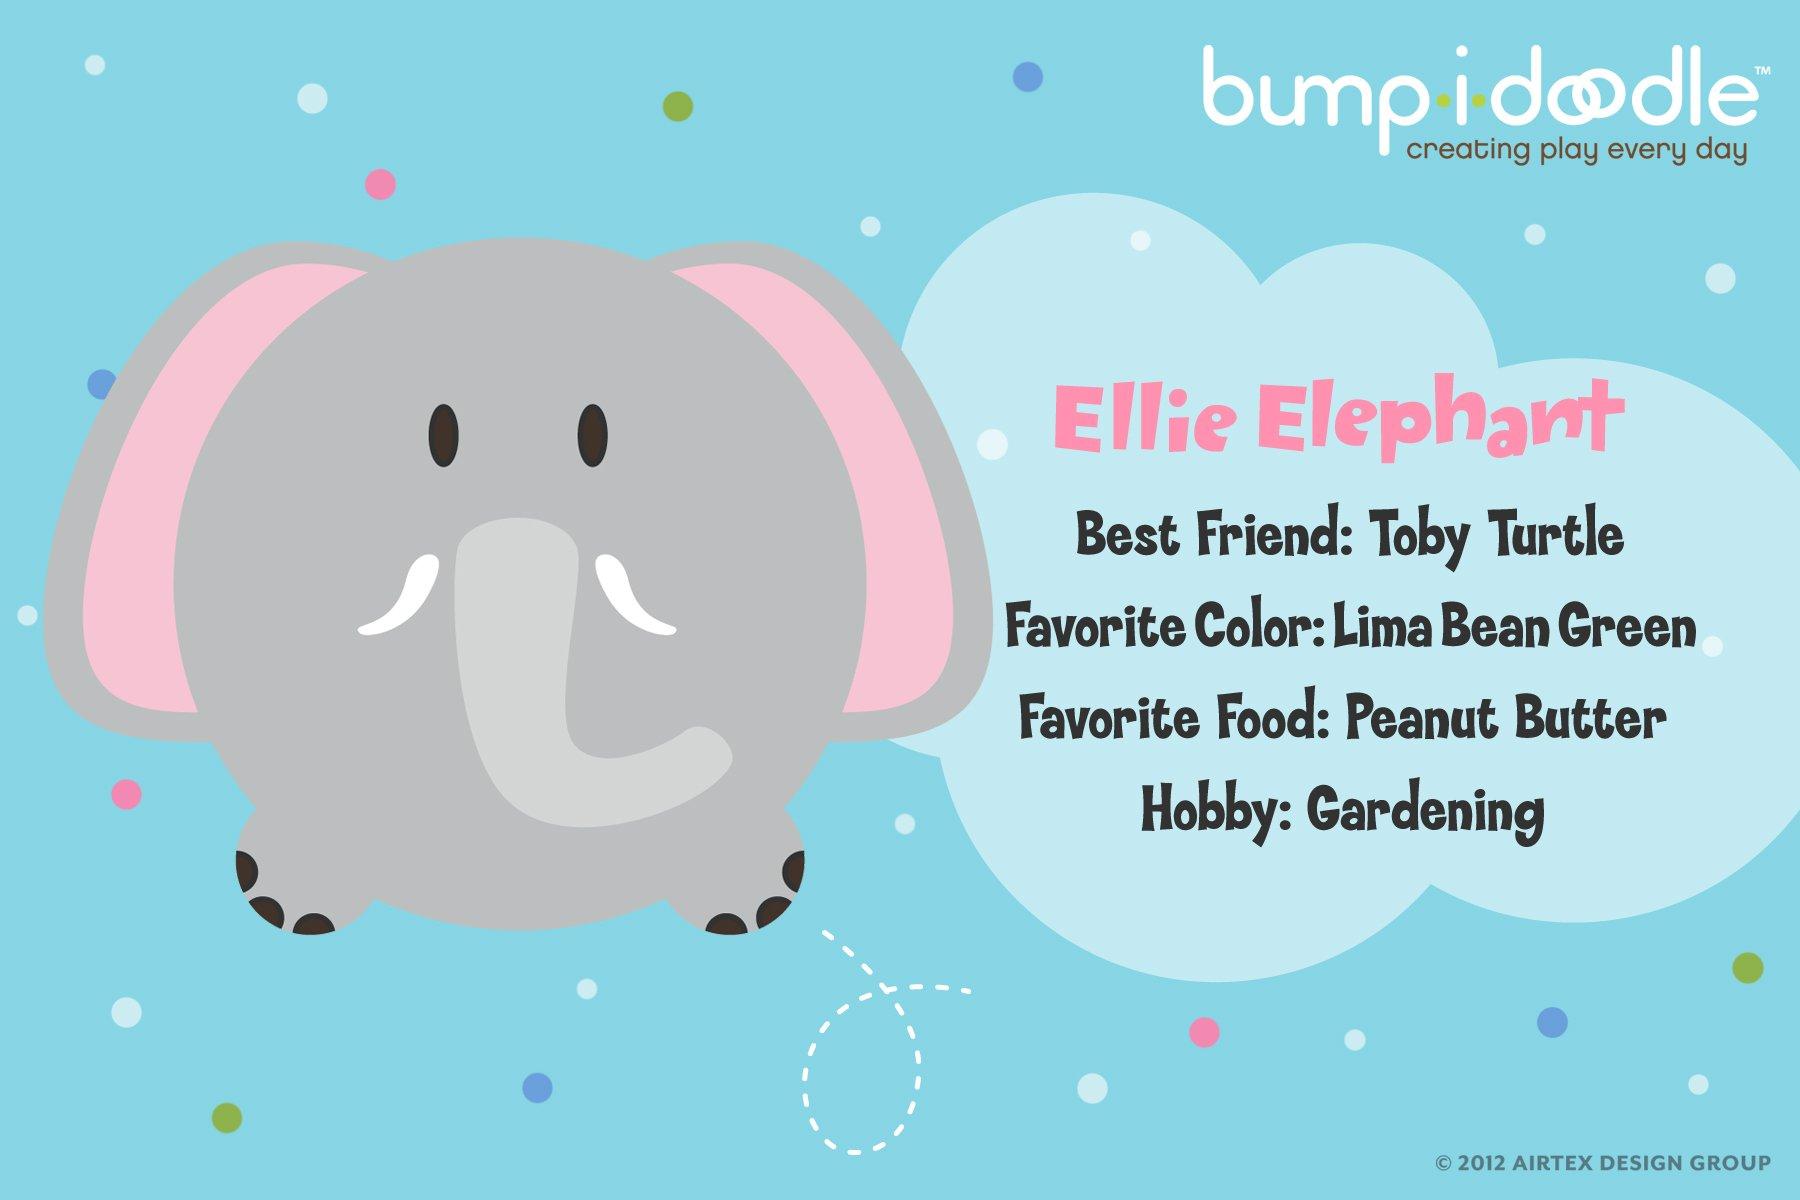 Bumpidoodle Ellie Elephant Bump-i-Doodle Pillow Floor Cushion - 30'' Jumbo Size